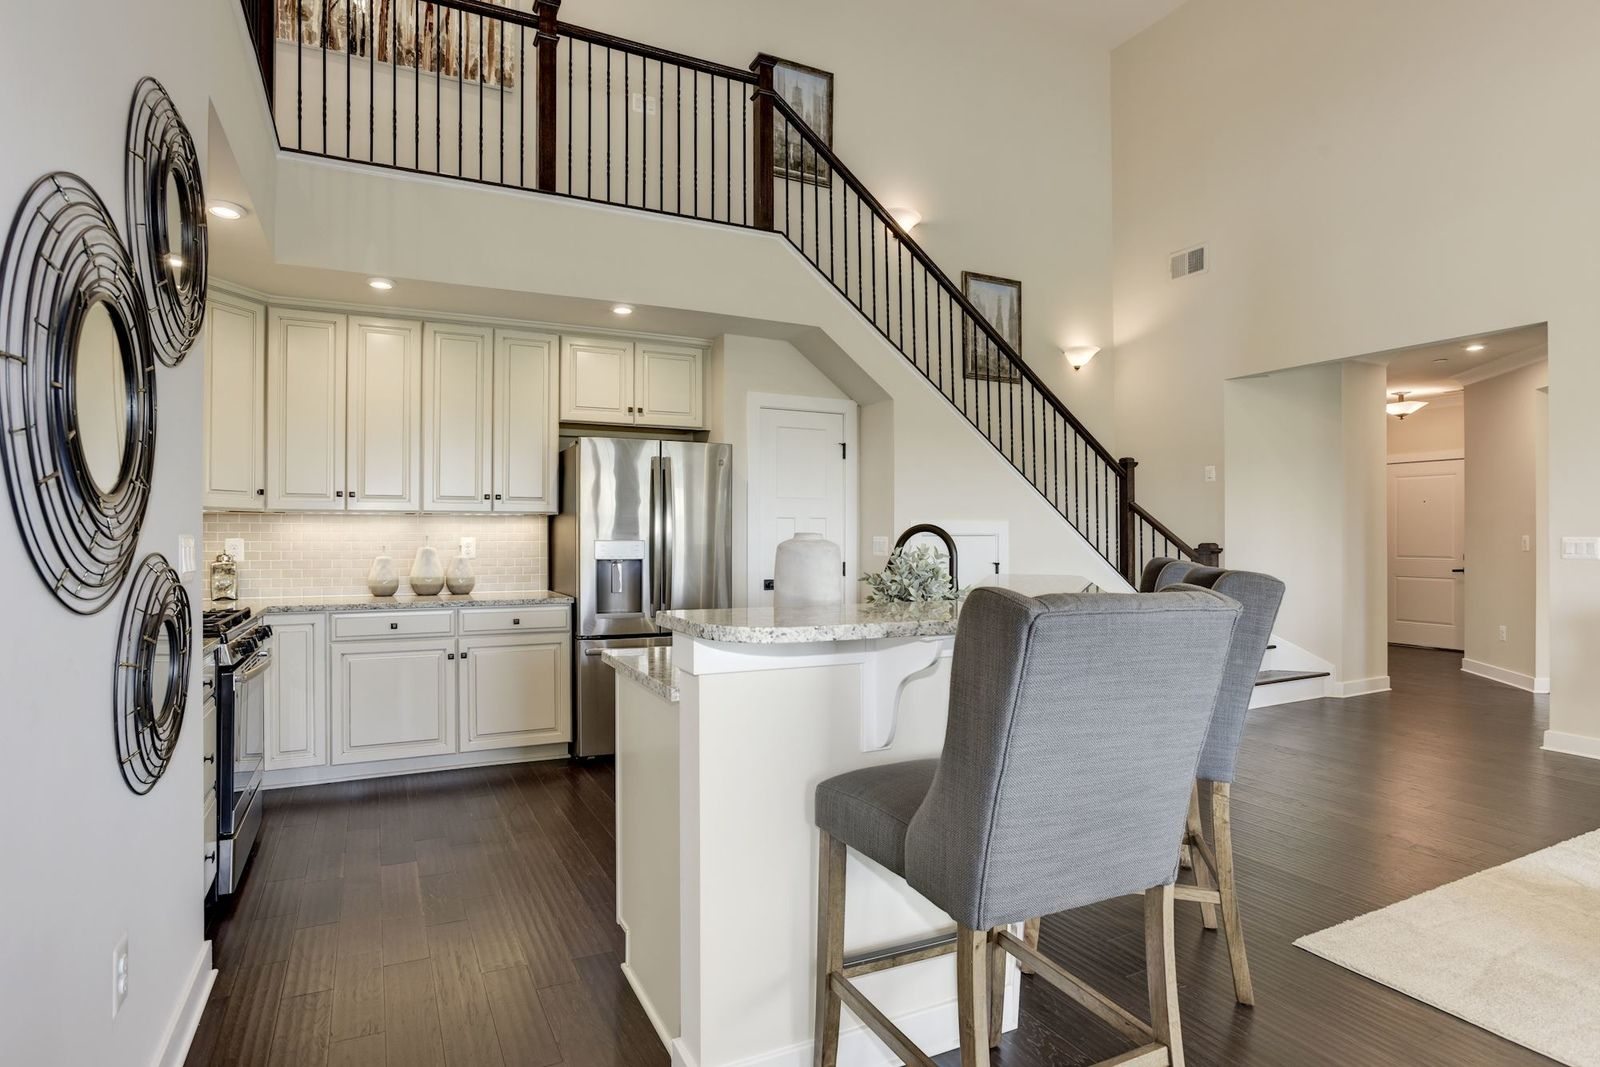 Kitchen-in-Chambord with Garage-at-Ellicott's Retreat – 55+ Active Adult Garage Condos-in-Ellicott City